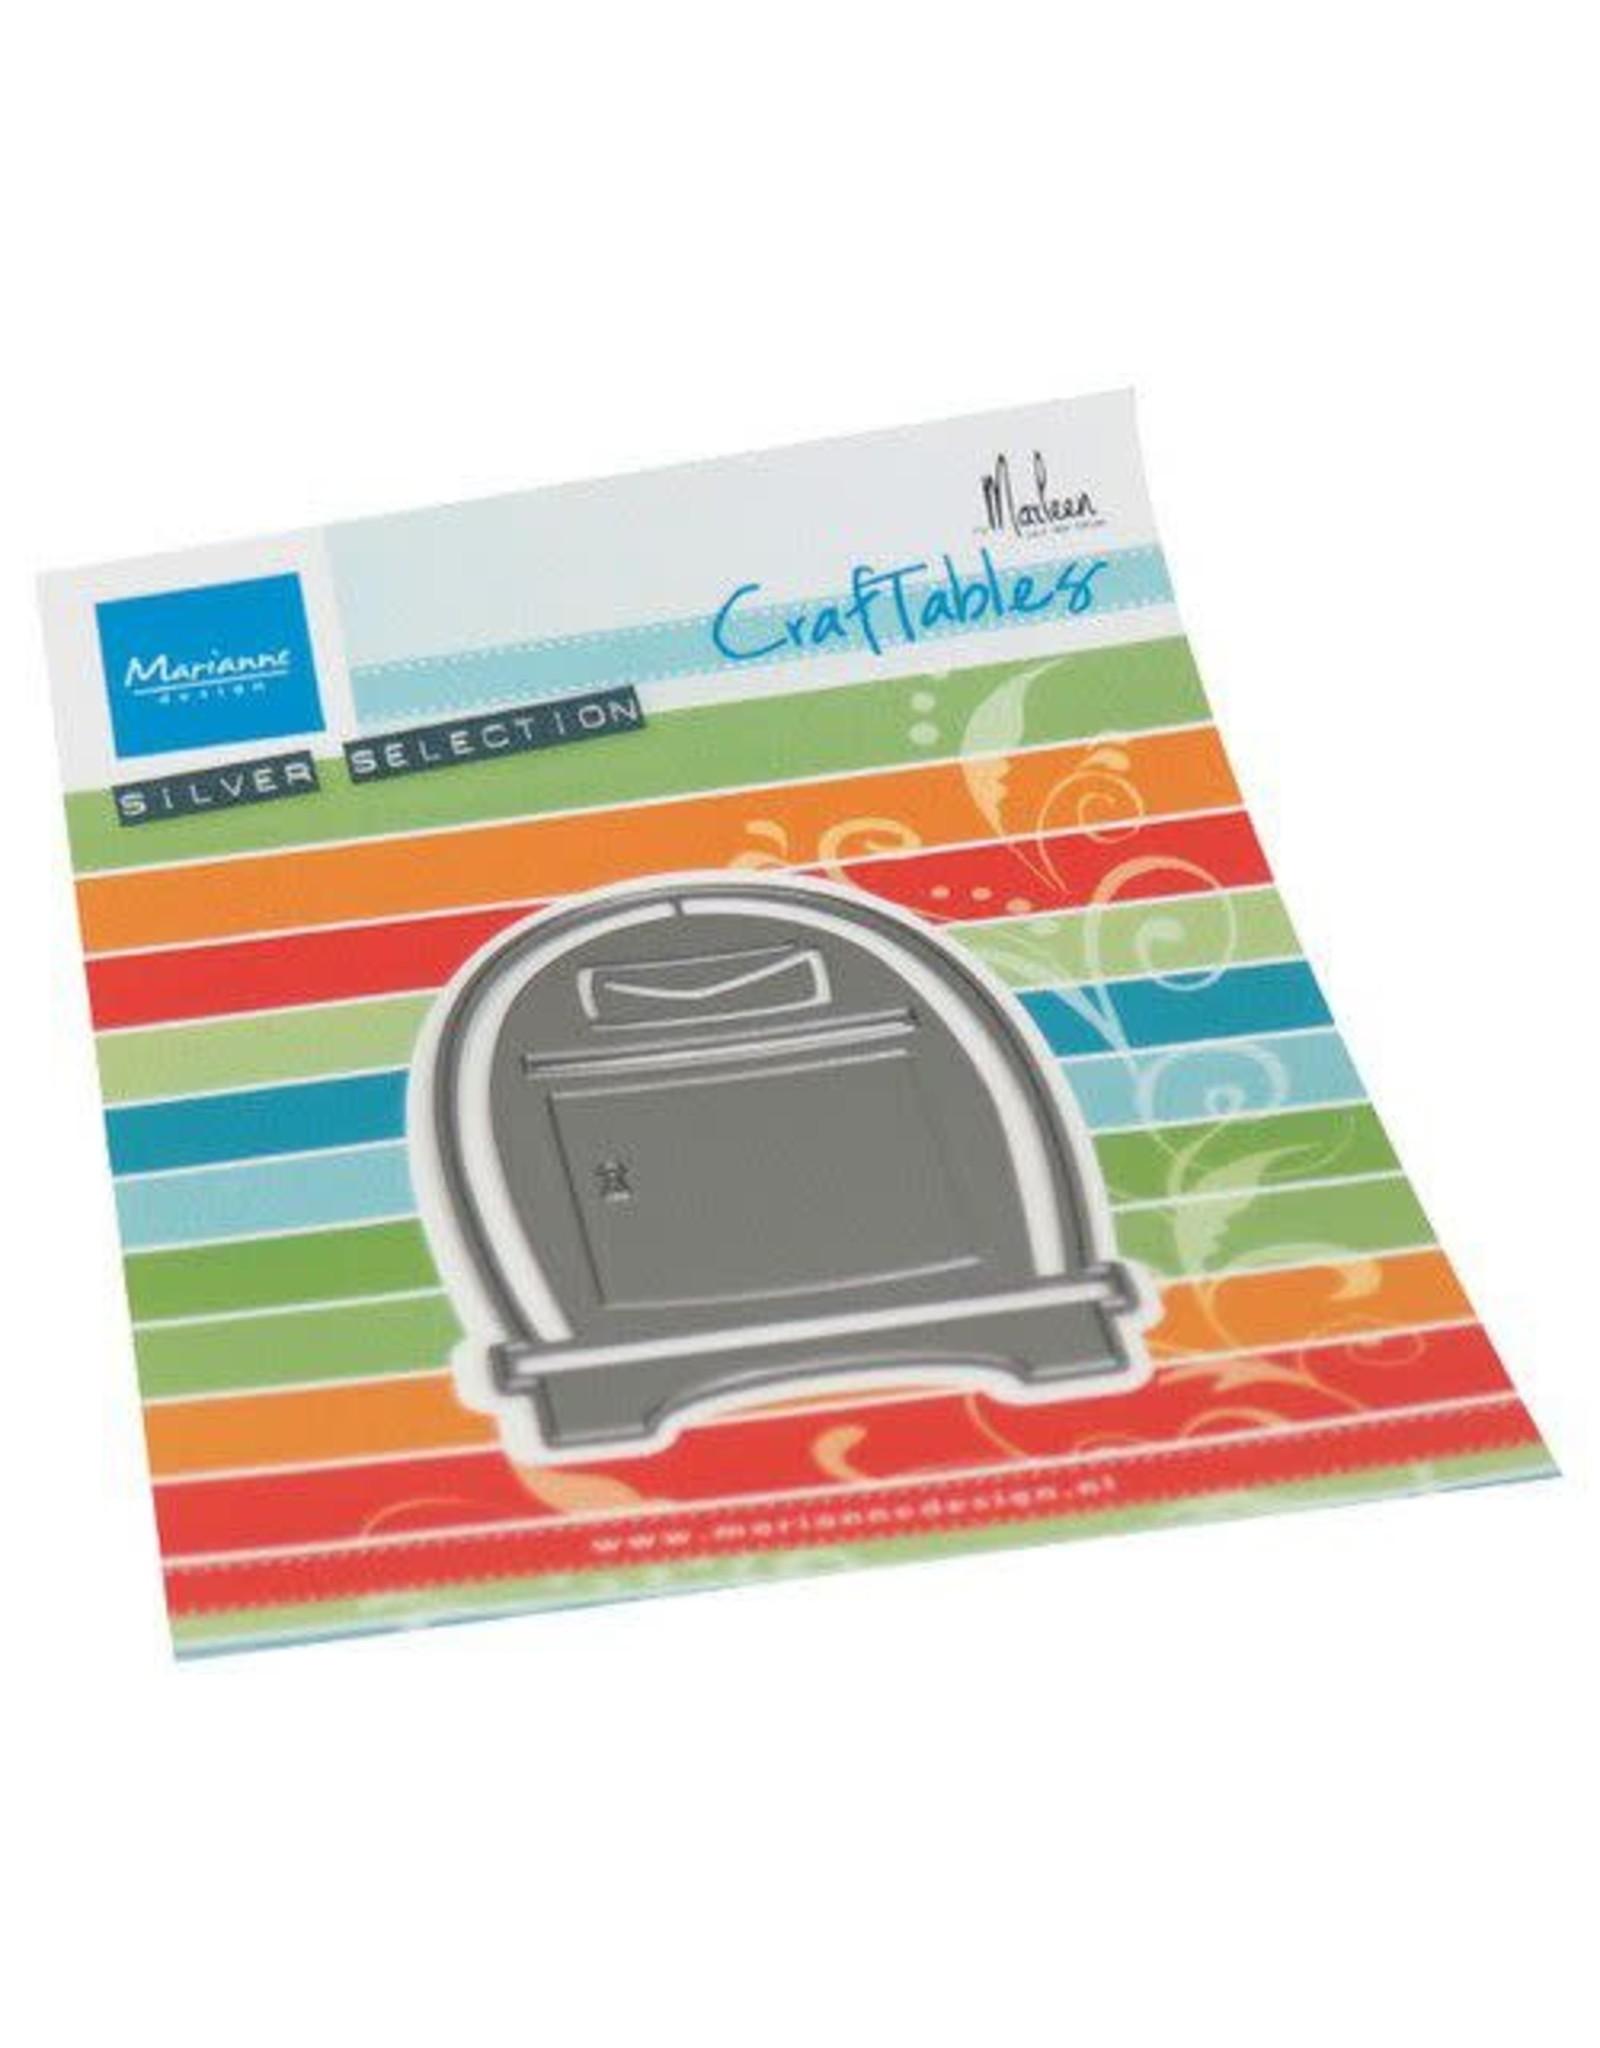 Marianne Design Marianne D Craftable Mailbox by Marleen CR1519 110x160 mm